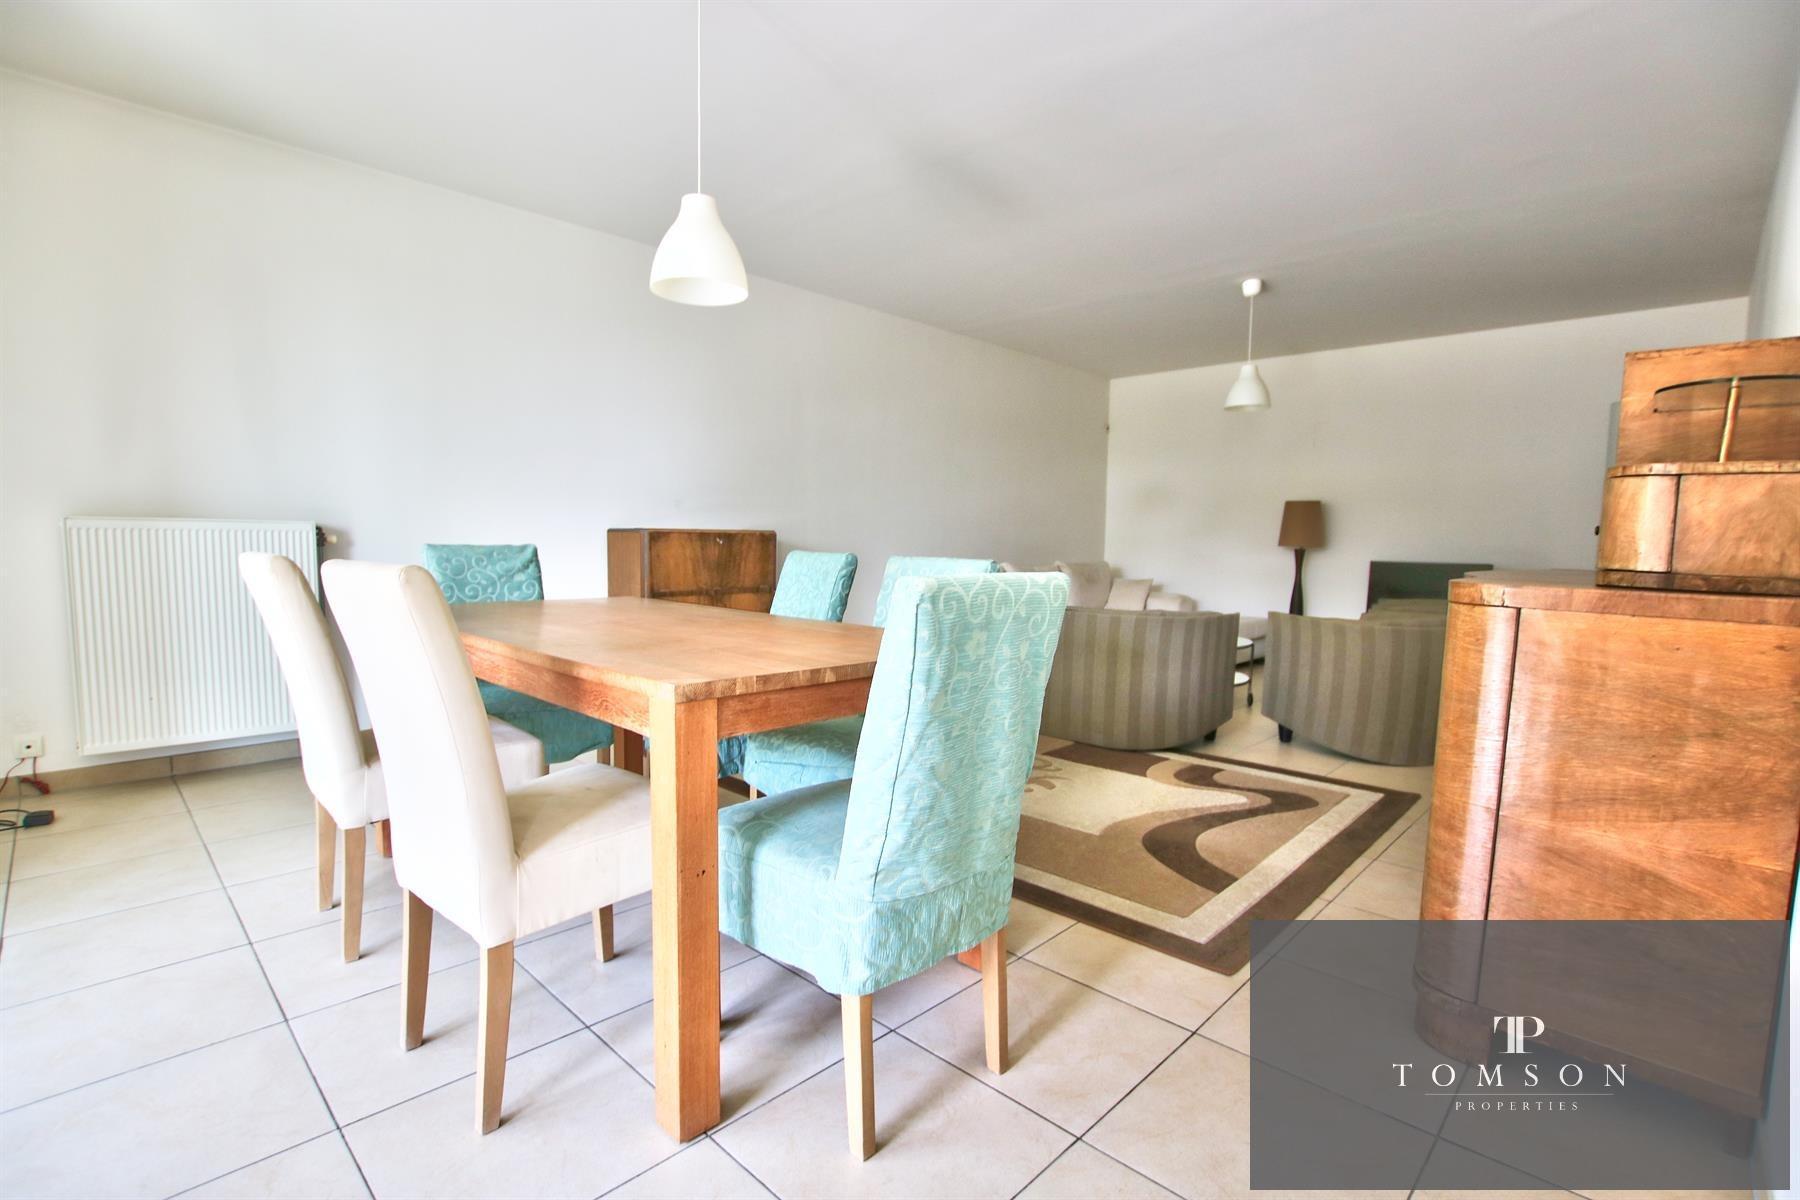 Appartement - Woluwe-Saint-Lambert - #4444905-1